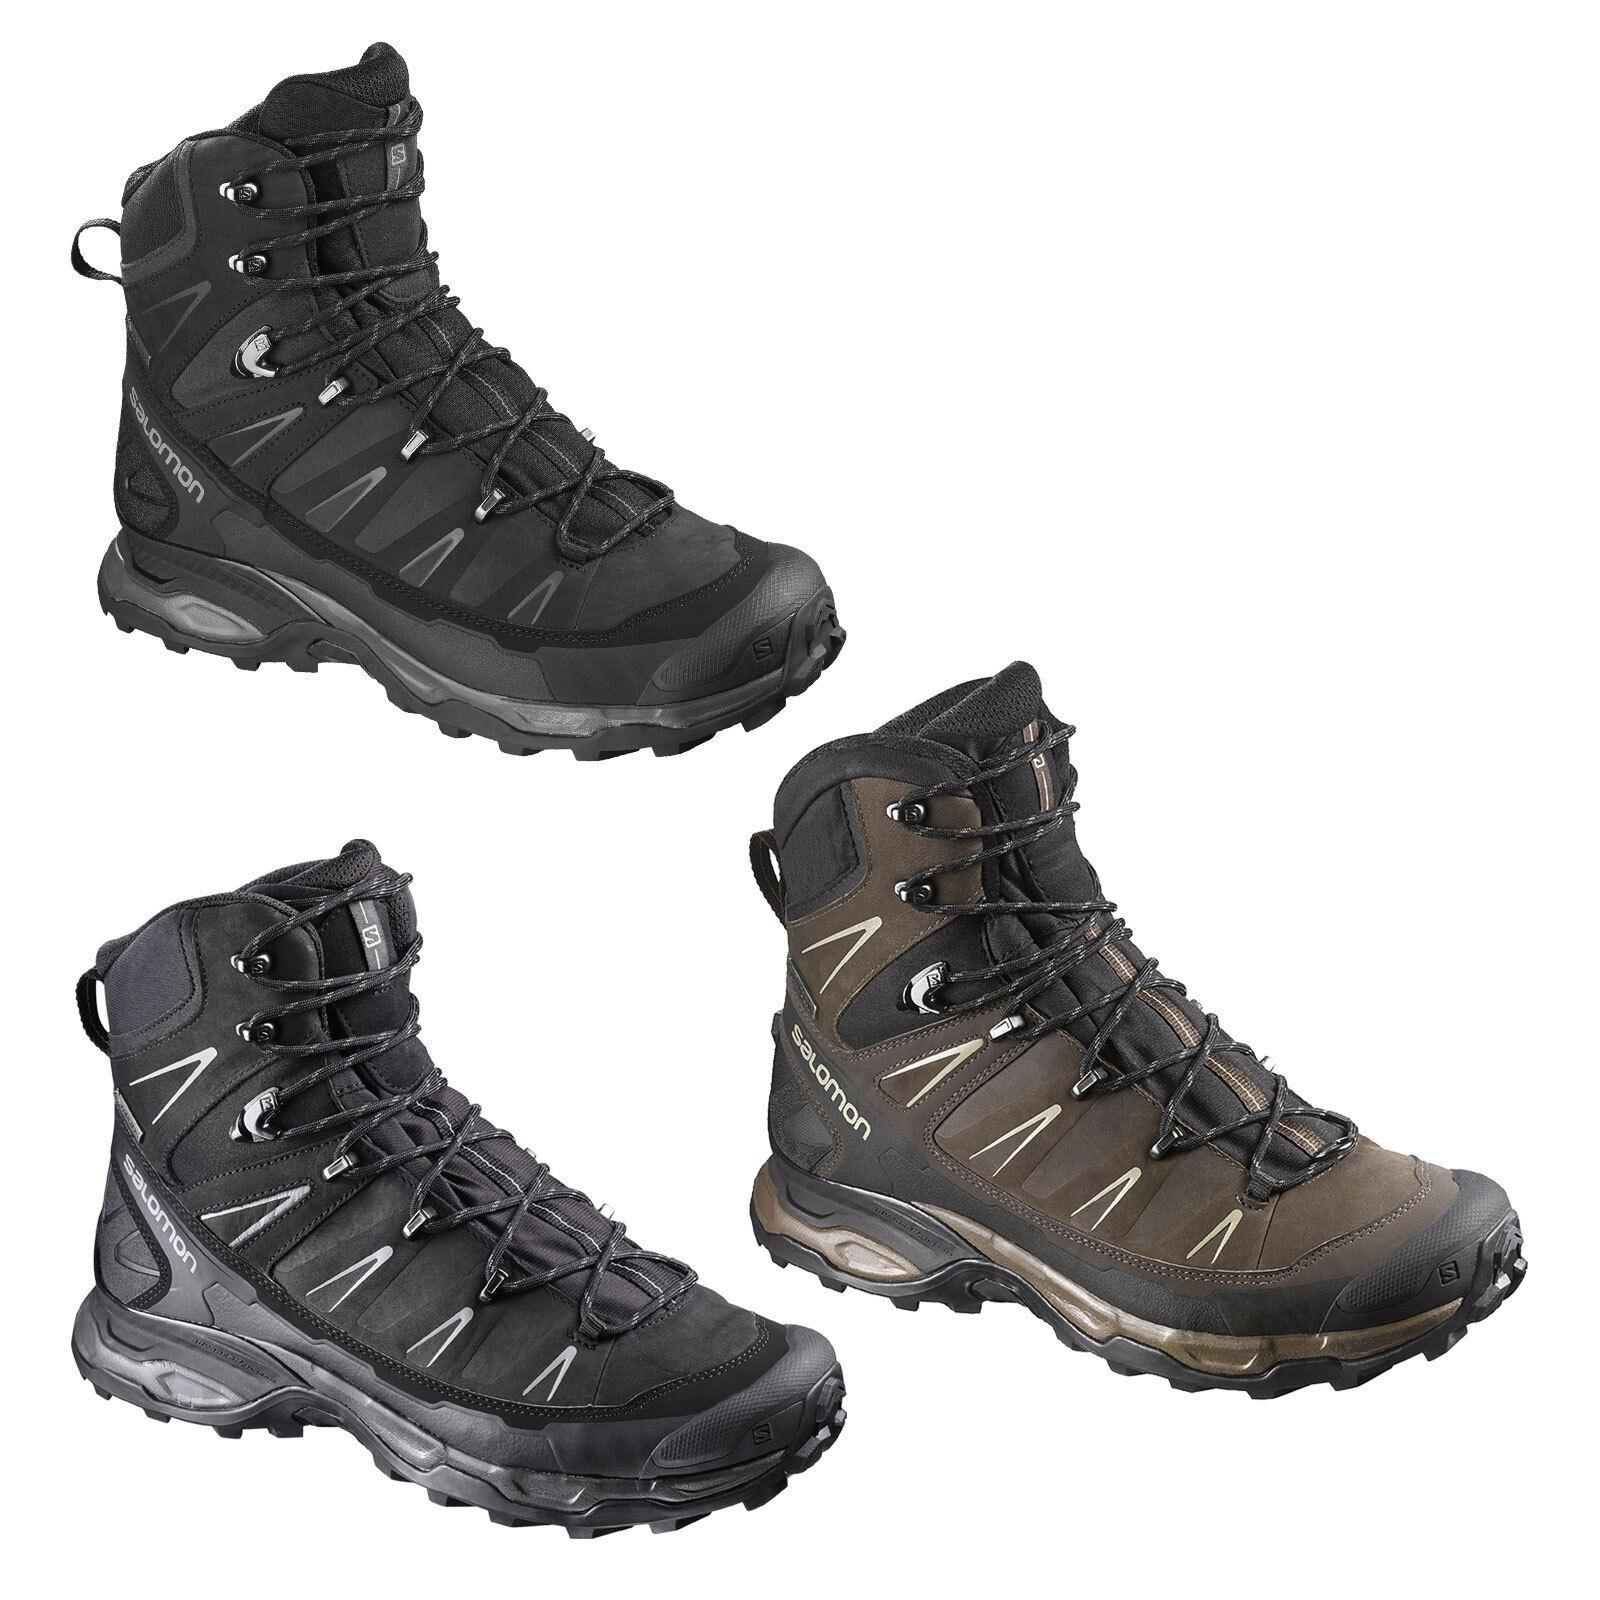 Salomon X Ultra Trek GTX GoreTex wasserdicht Herren-Wanderschuhe Boots Trekking